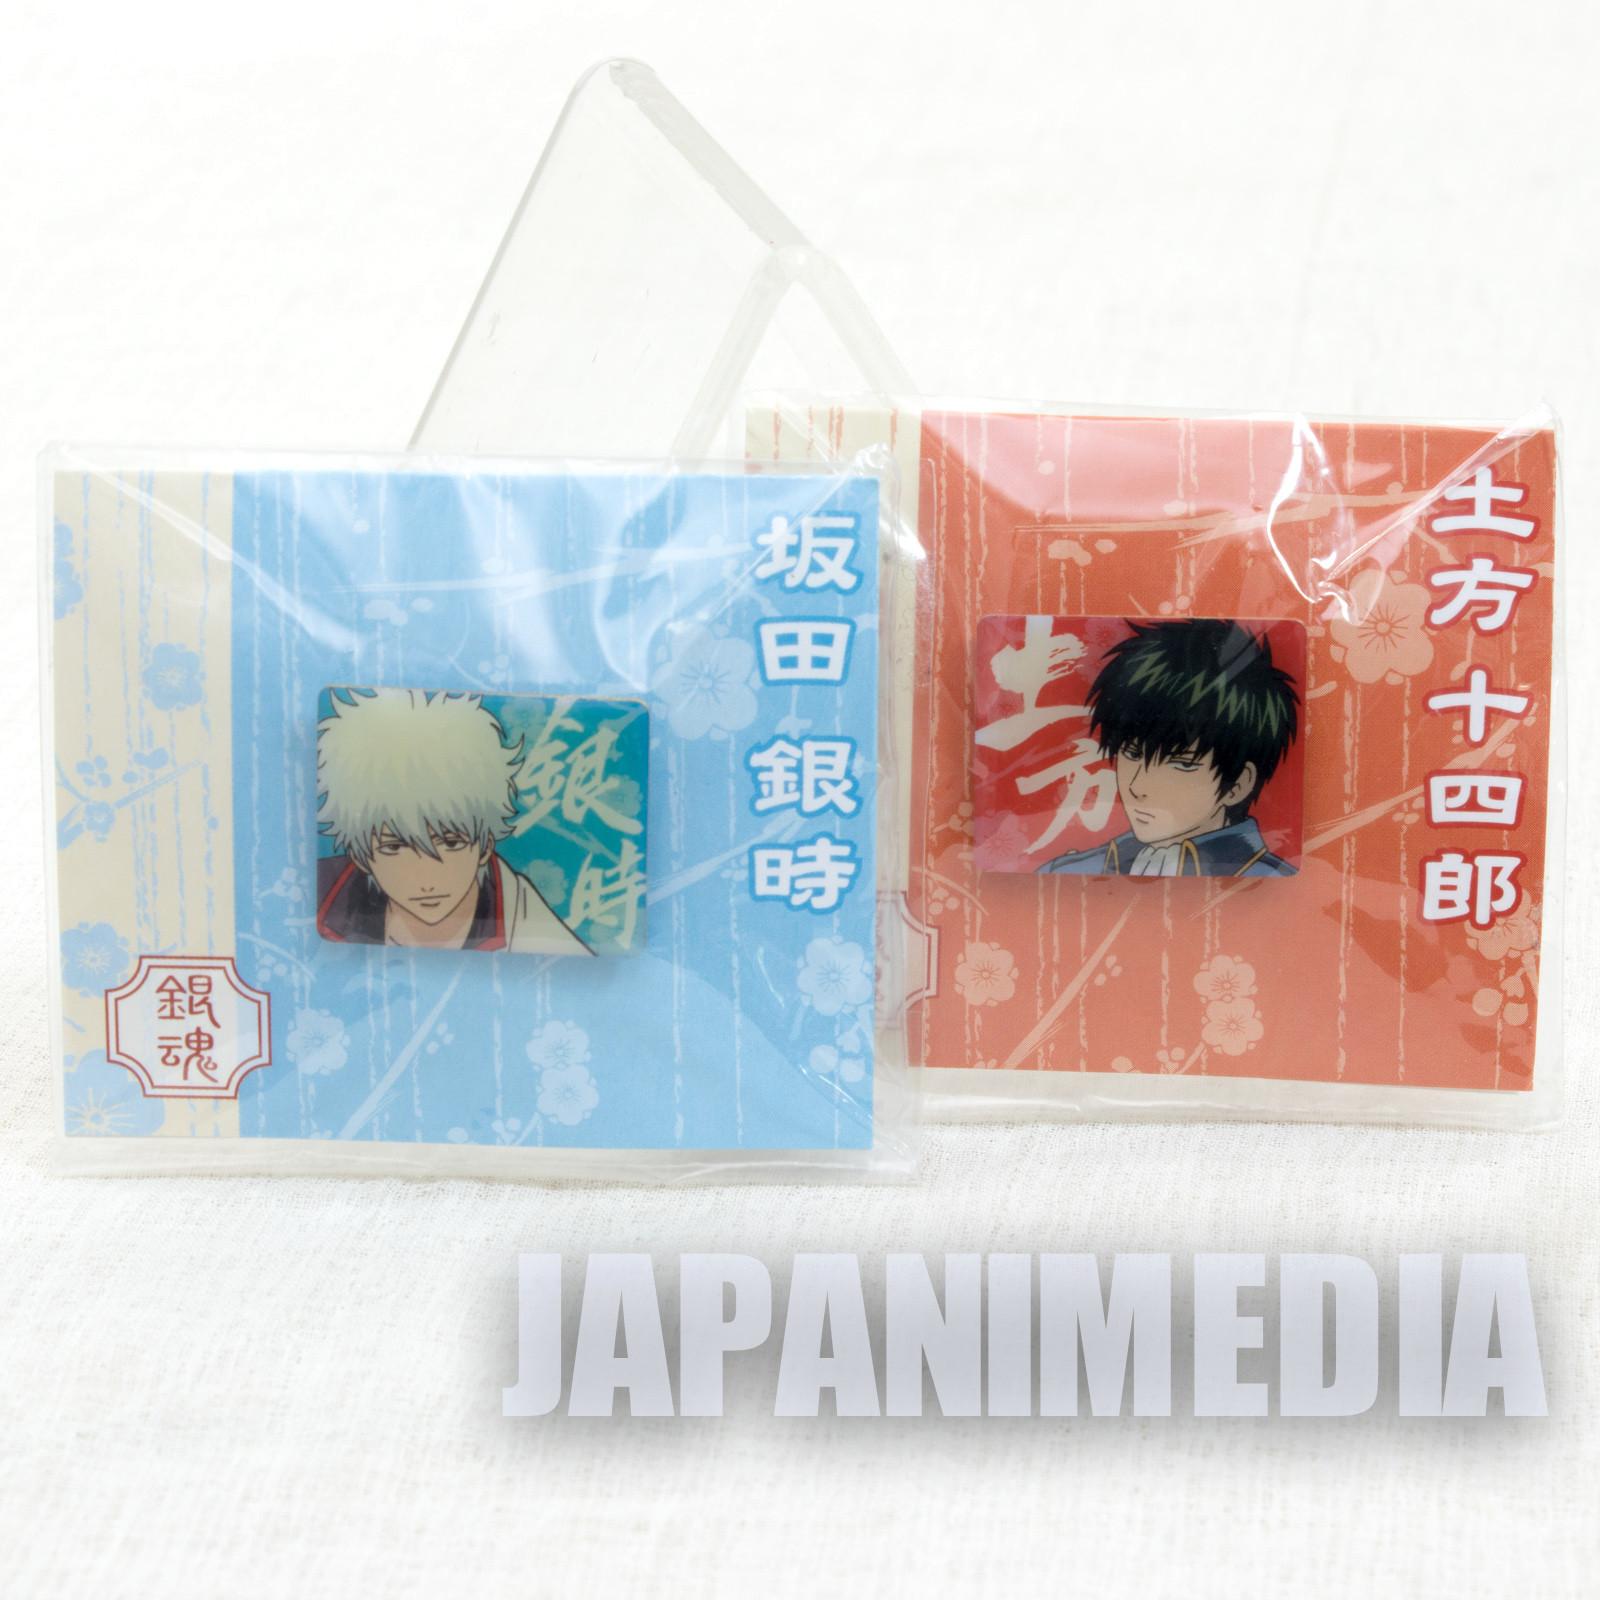 Gintama Gintoki Sakata & Toshiro Hijikata Pins 2pc Set JAPAN ANIME MANGA